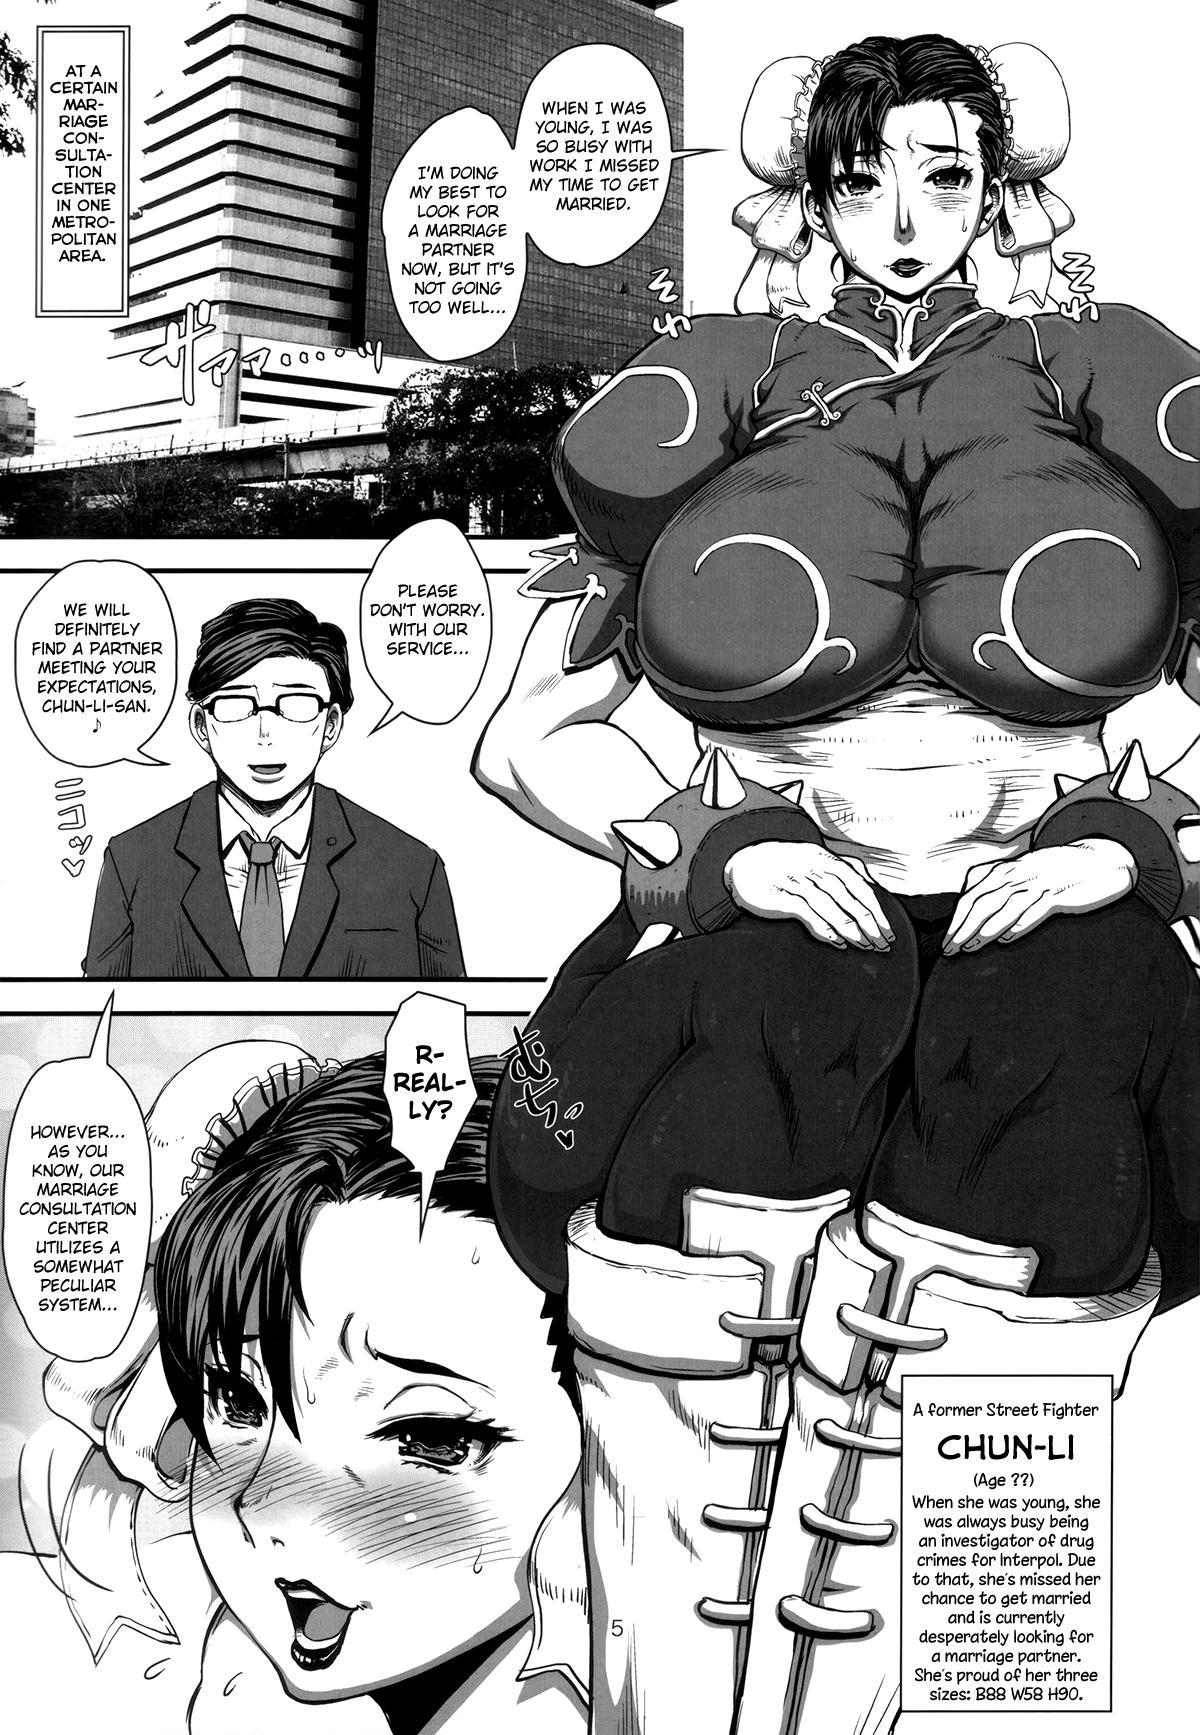 (C87) [8graphica (Yoshitama Ichirou, Nanakichi)] METABOLISM Chun-Li A Beautiful and Mature Chun-Li-san has Serious Sex with the Candidates while Looking For a Marriage Partner. (Street Fighter) [English] [biribiri] 3